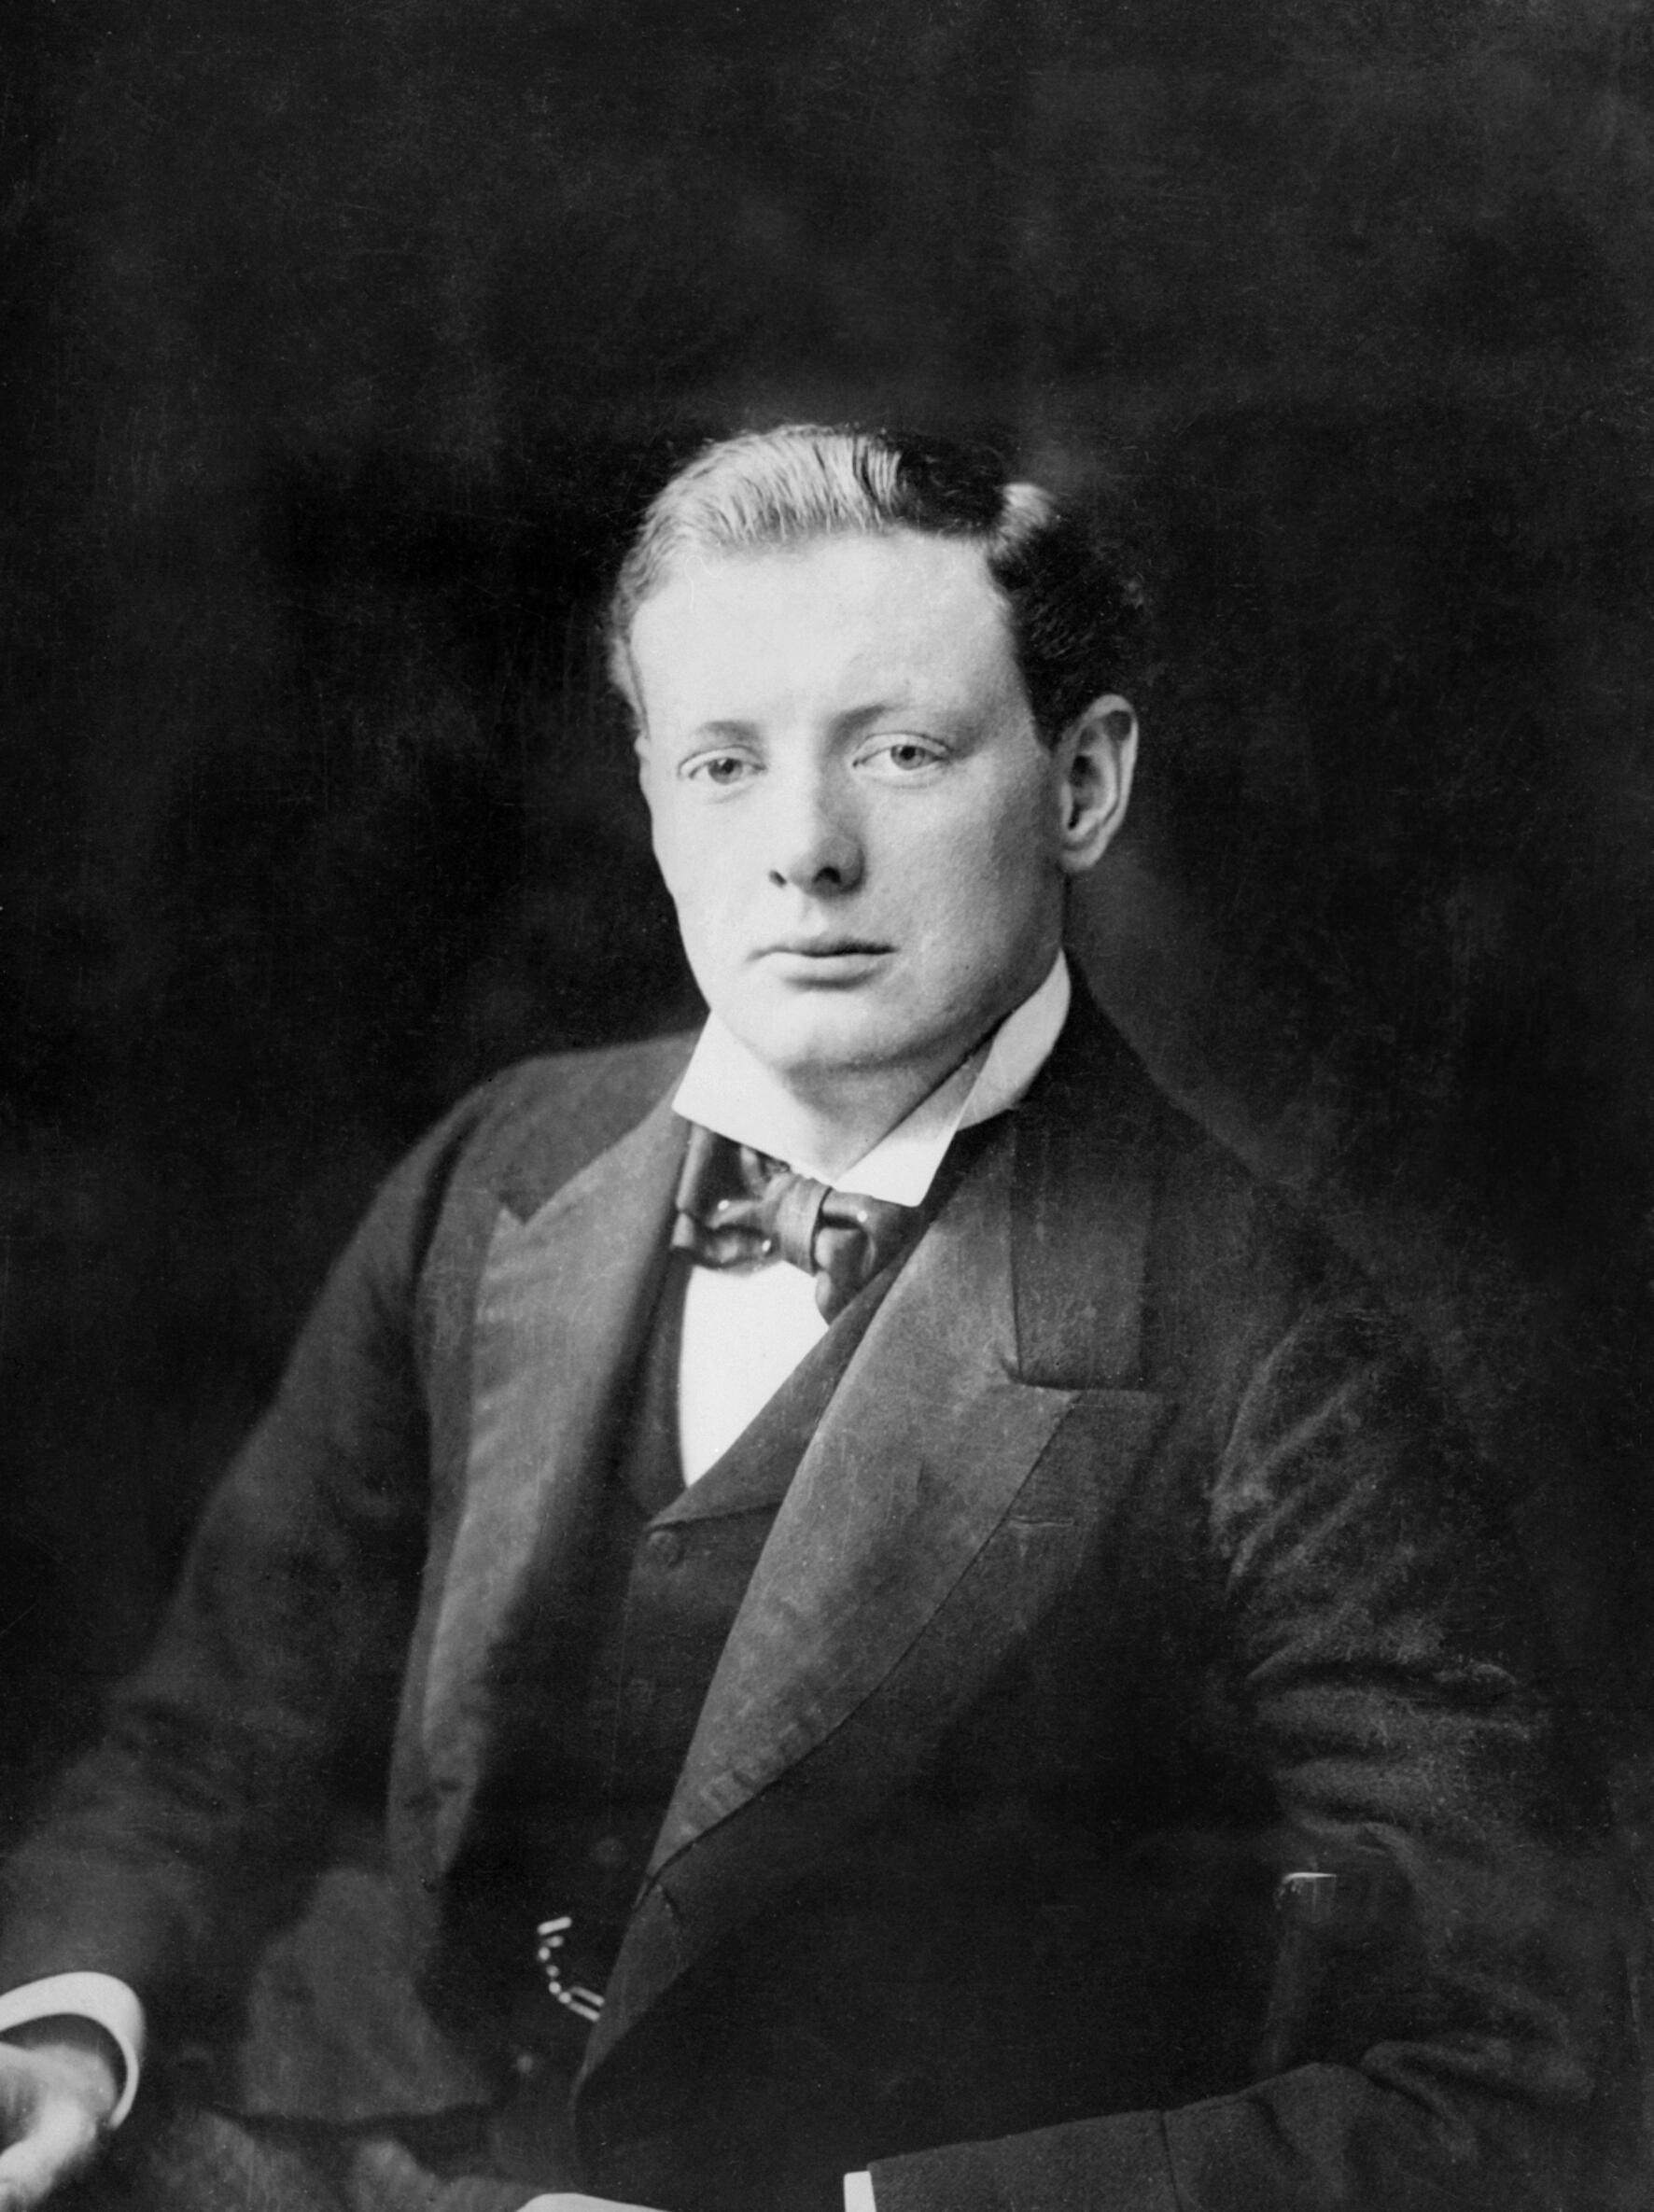 Winston_Churchill_1874_-_1965_Q113382.jpg